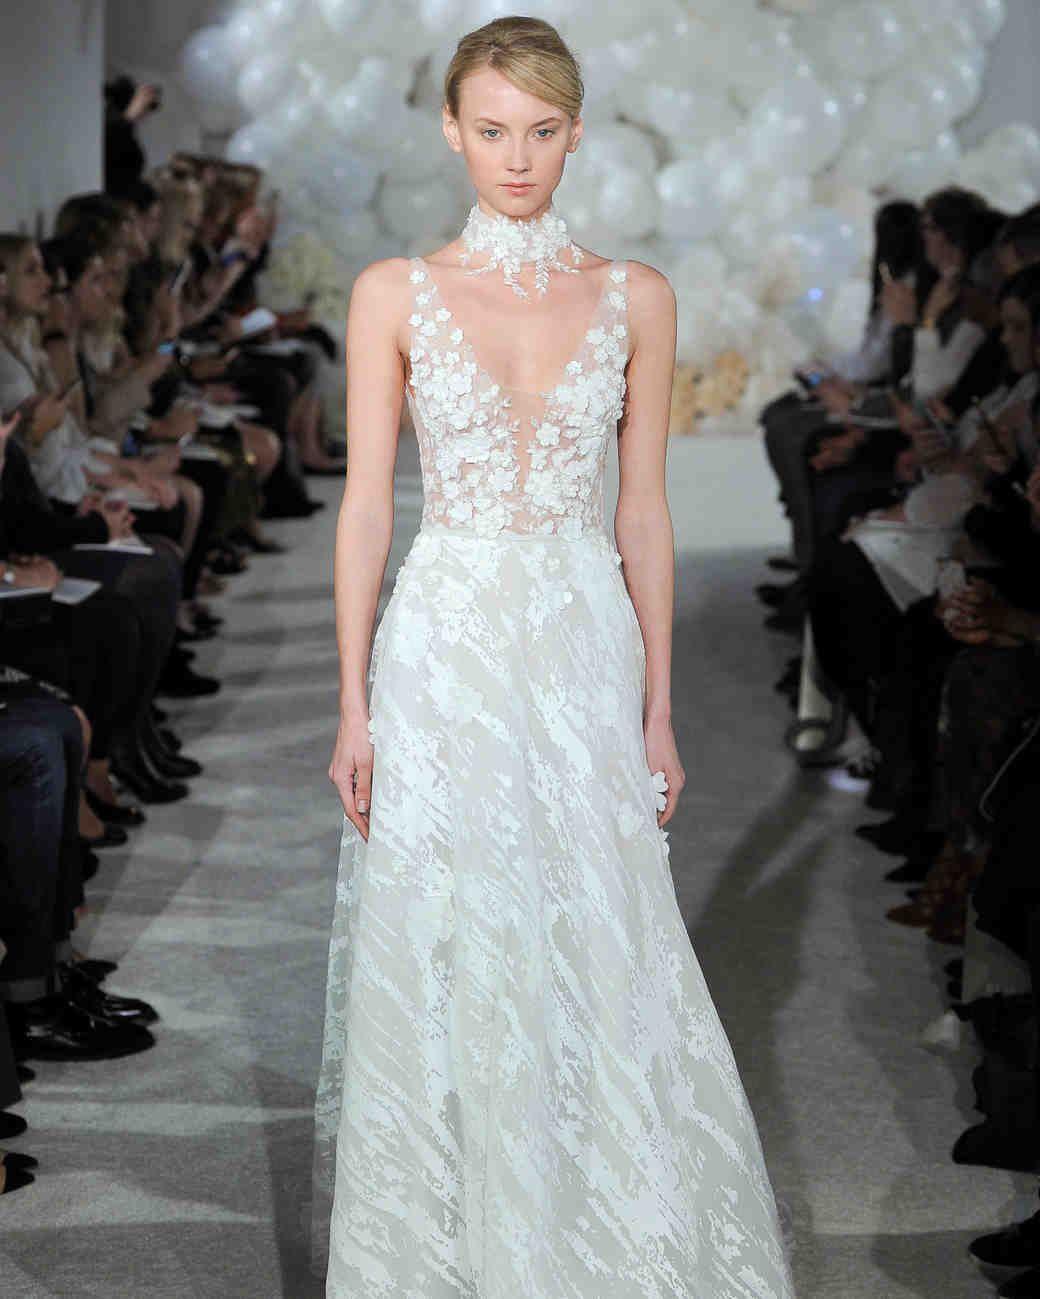 Mira zwillinger spring wedding dress collection martha